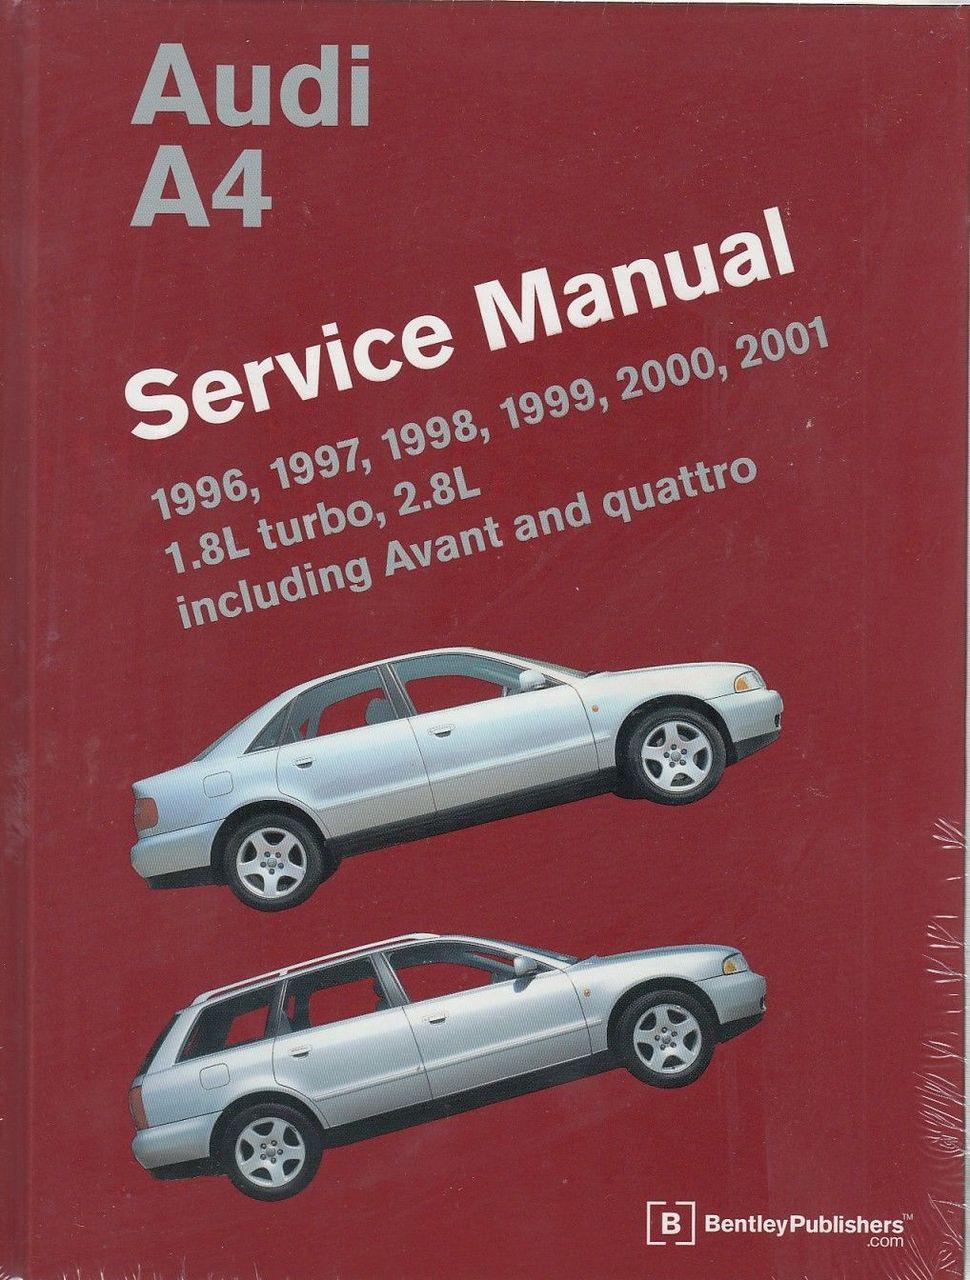 Audi A4 1996 - 2001 Workshop Manual ...